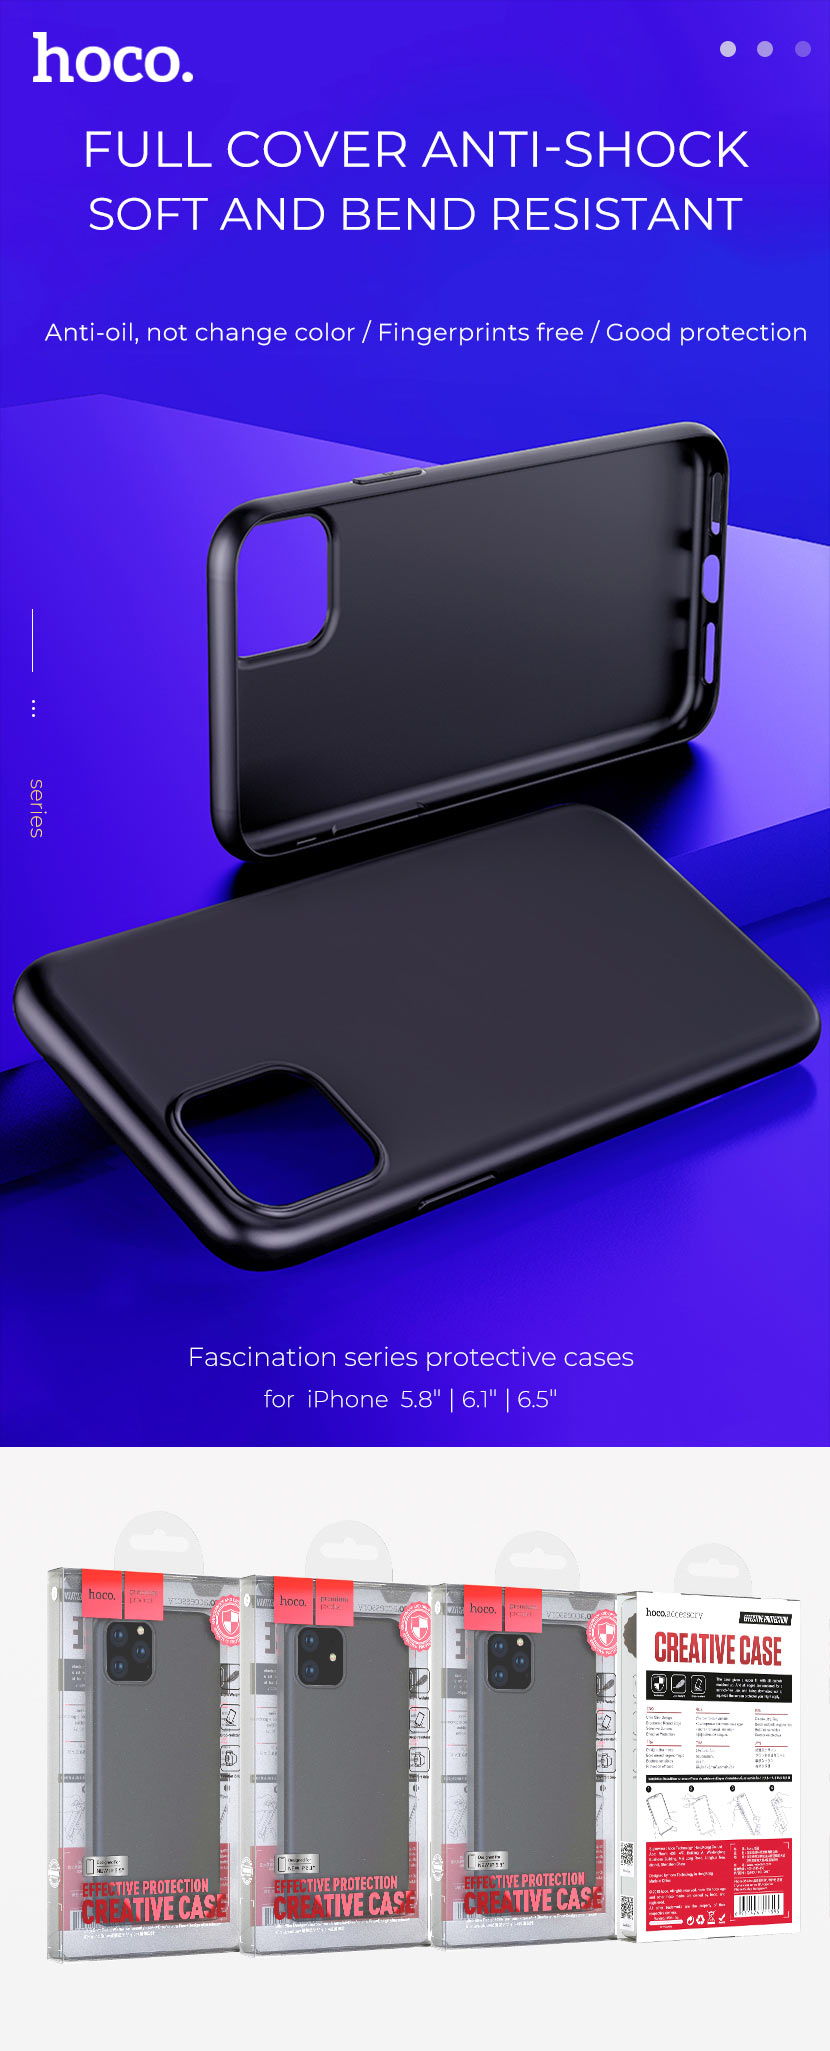 hoco news 2019 iphone case collection fascination en